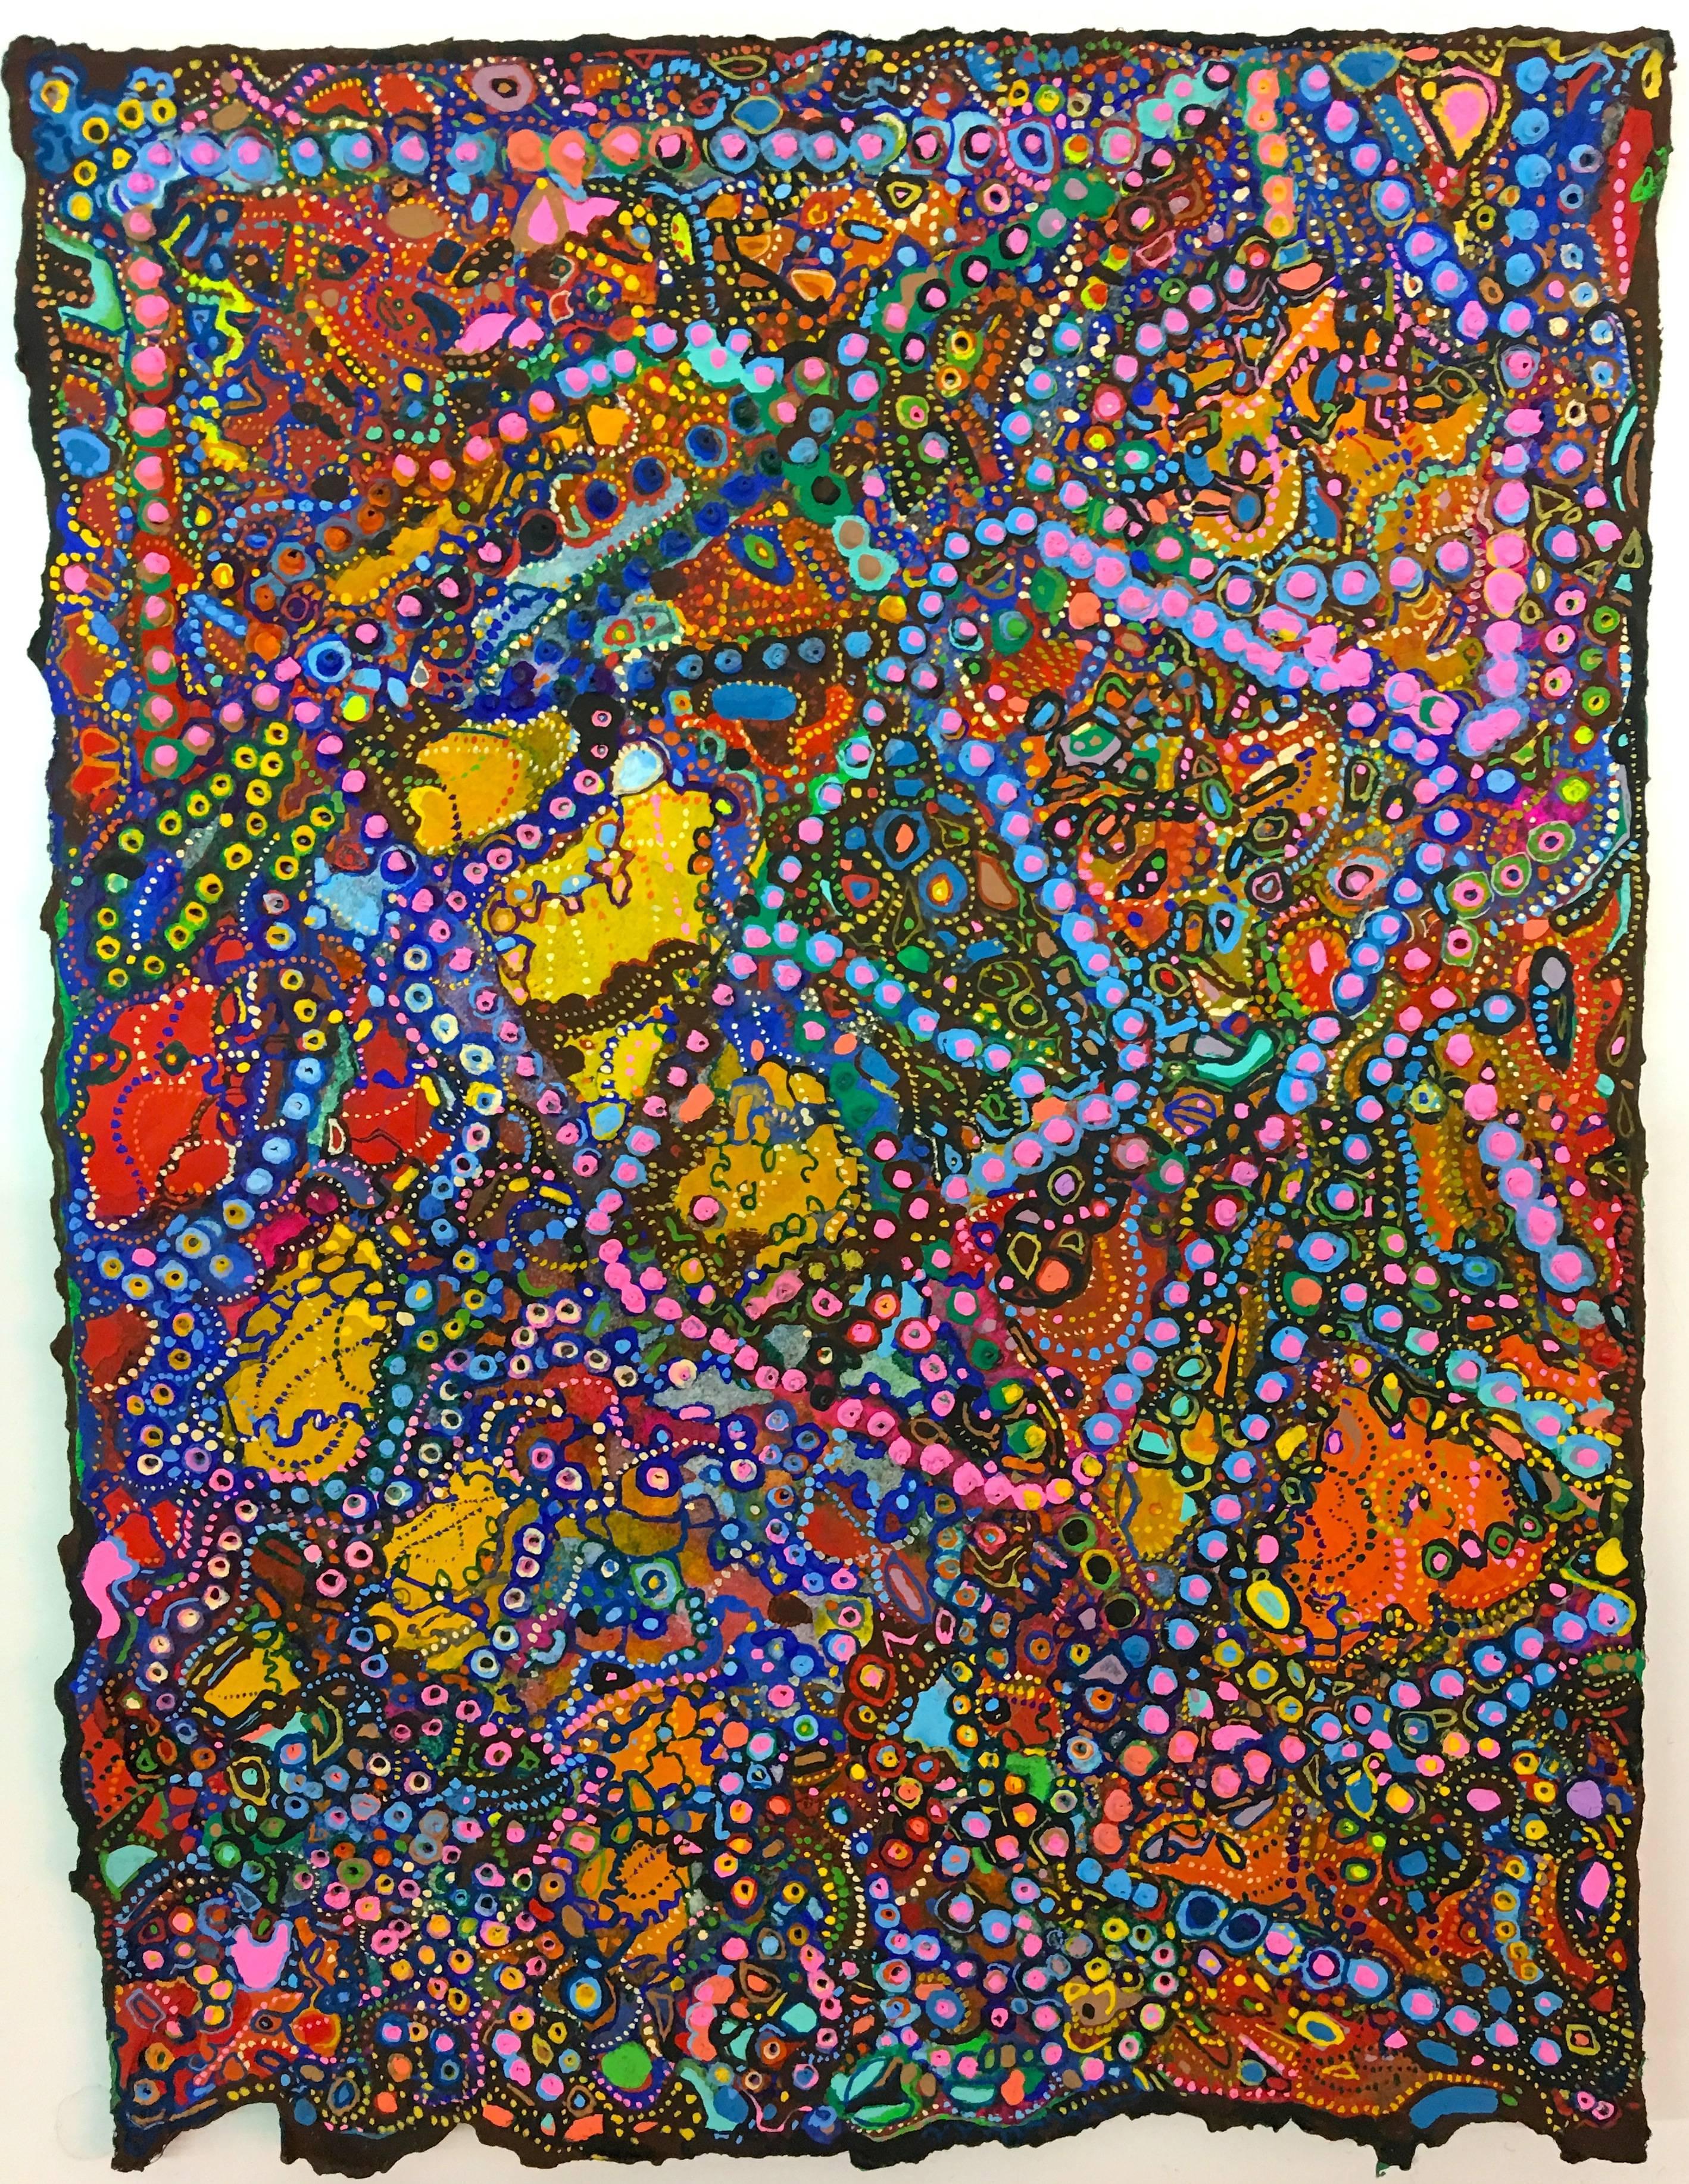 David Ambrose, Modular Stipple, 2017, Watercolor, Gouache, Handmade Paper